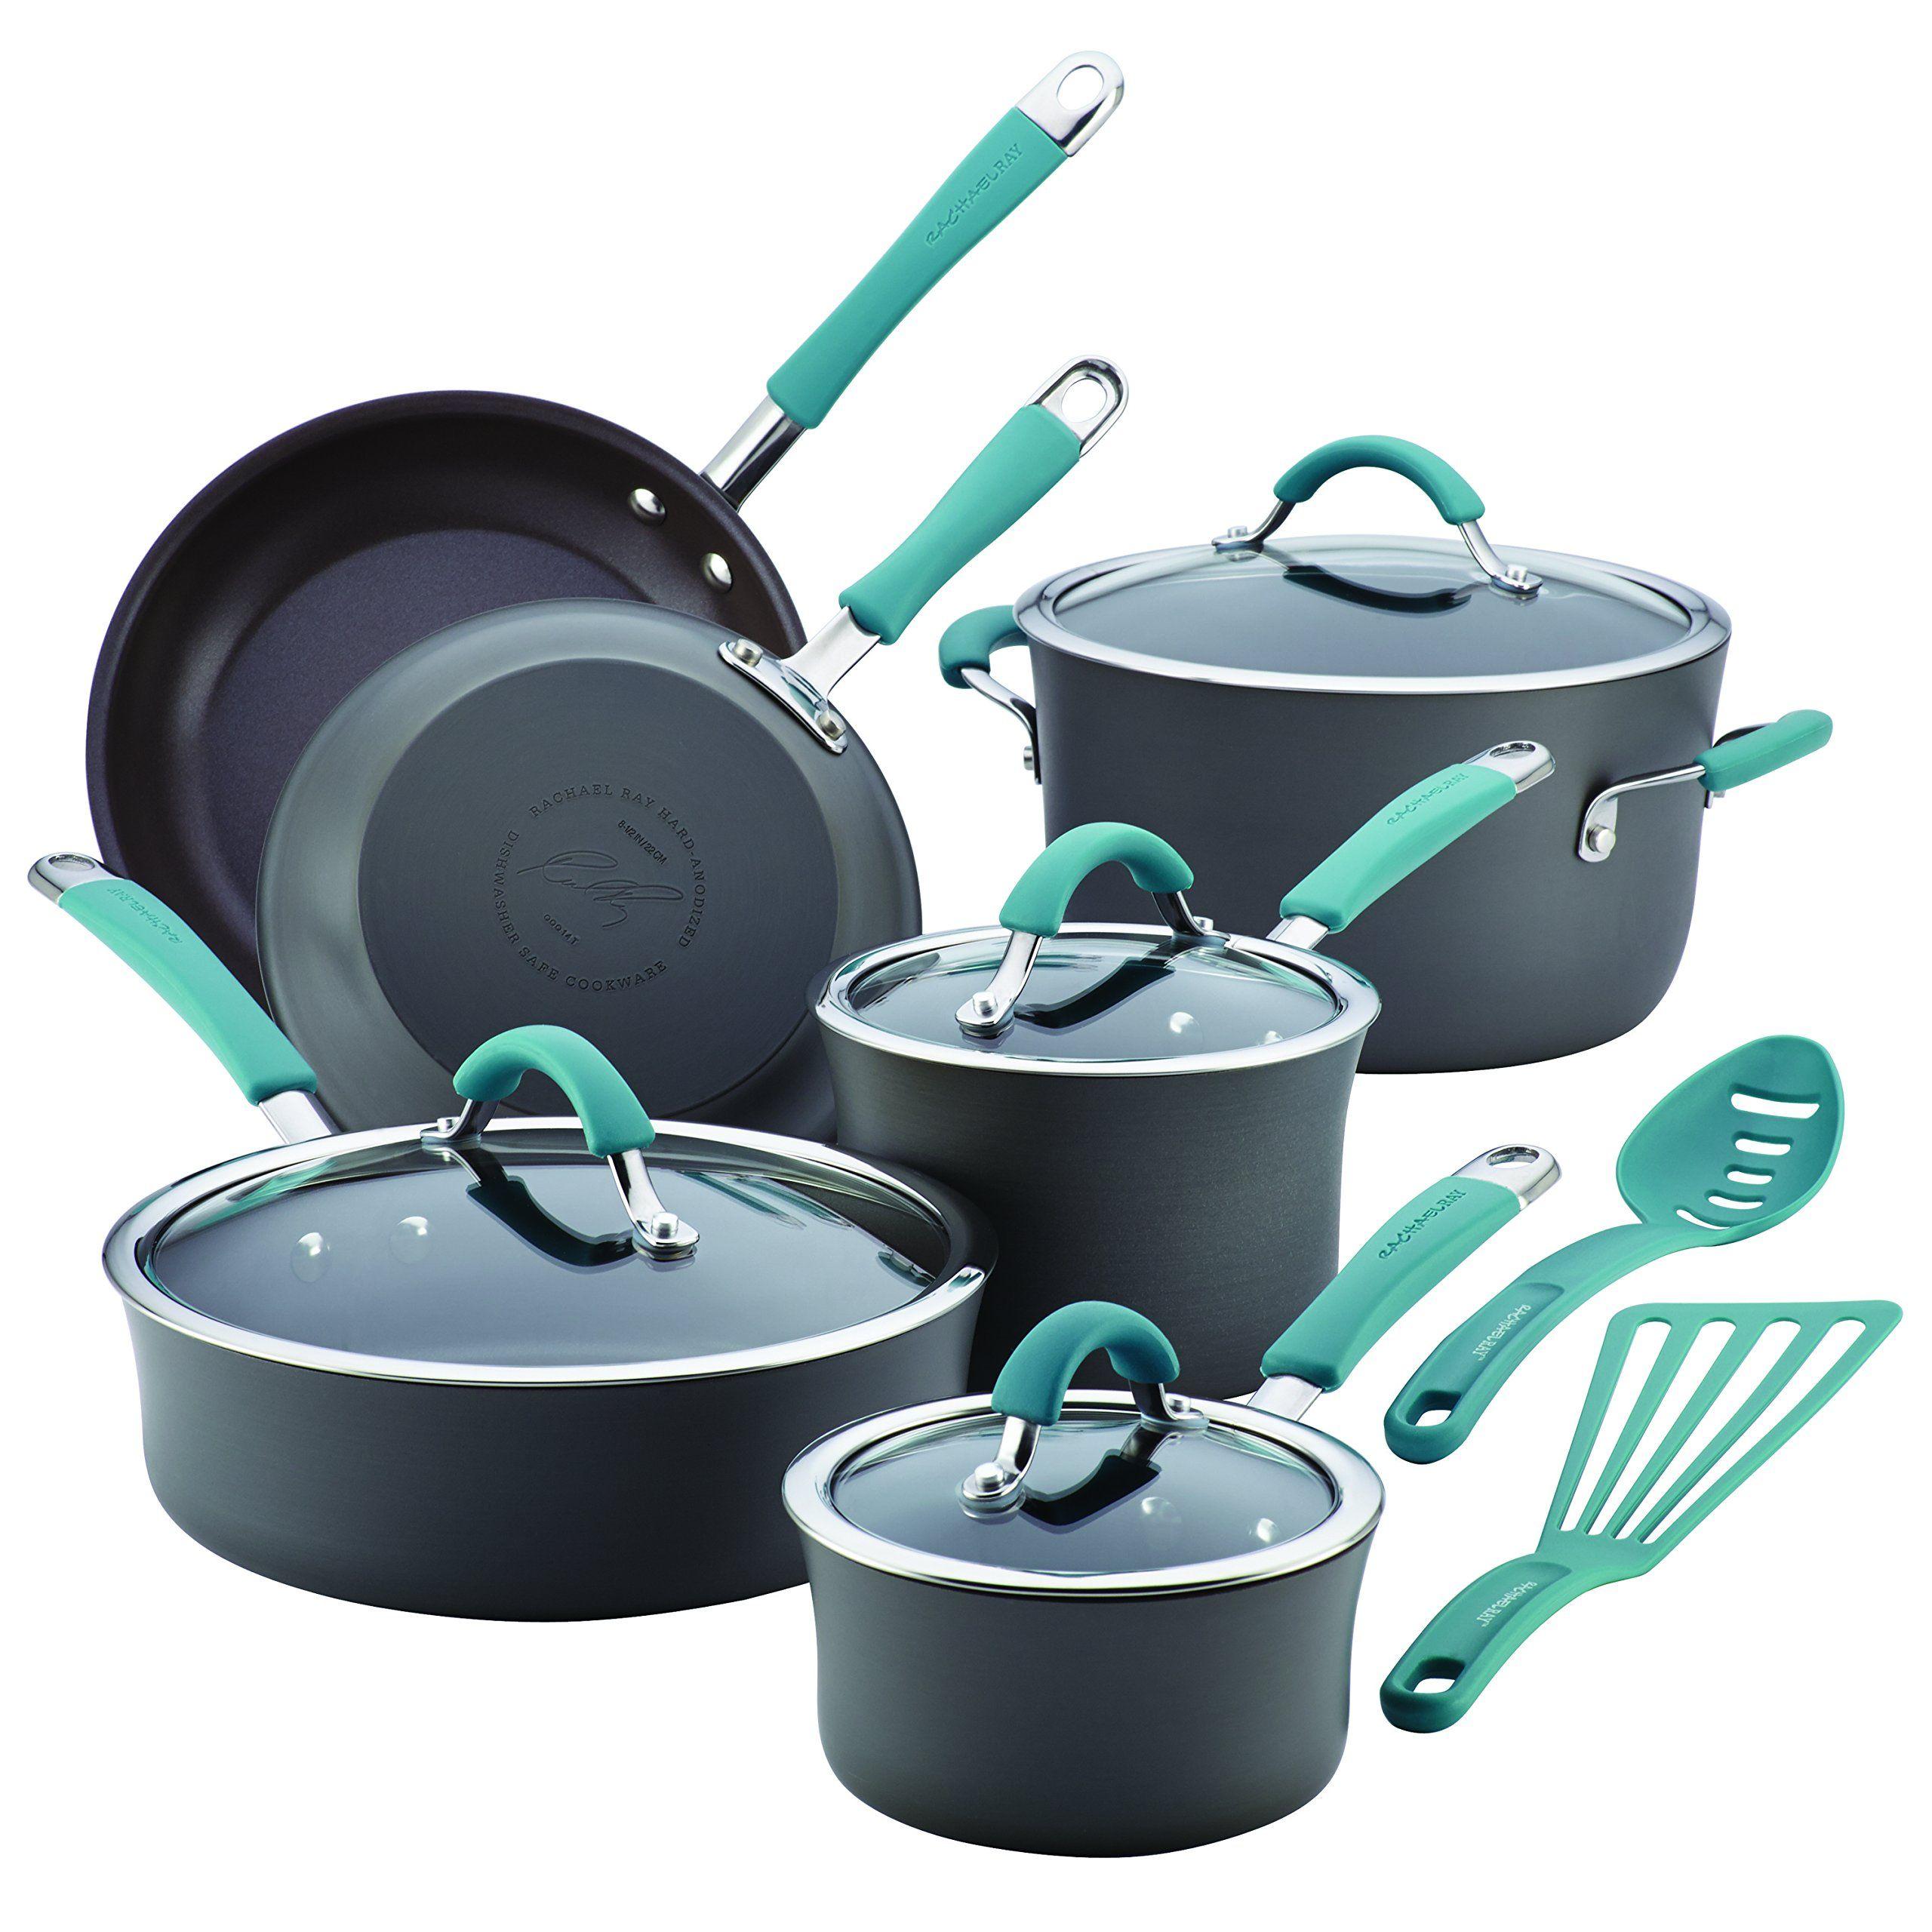 Rachael Ray Cucina 87641 12-Piece Cookware Set, Gray,Agave Blue ...